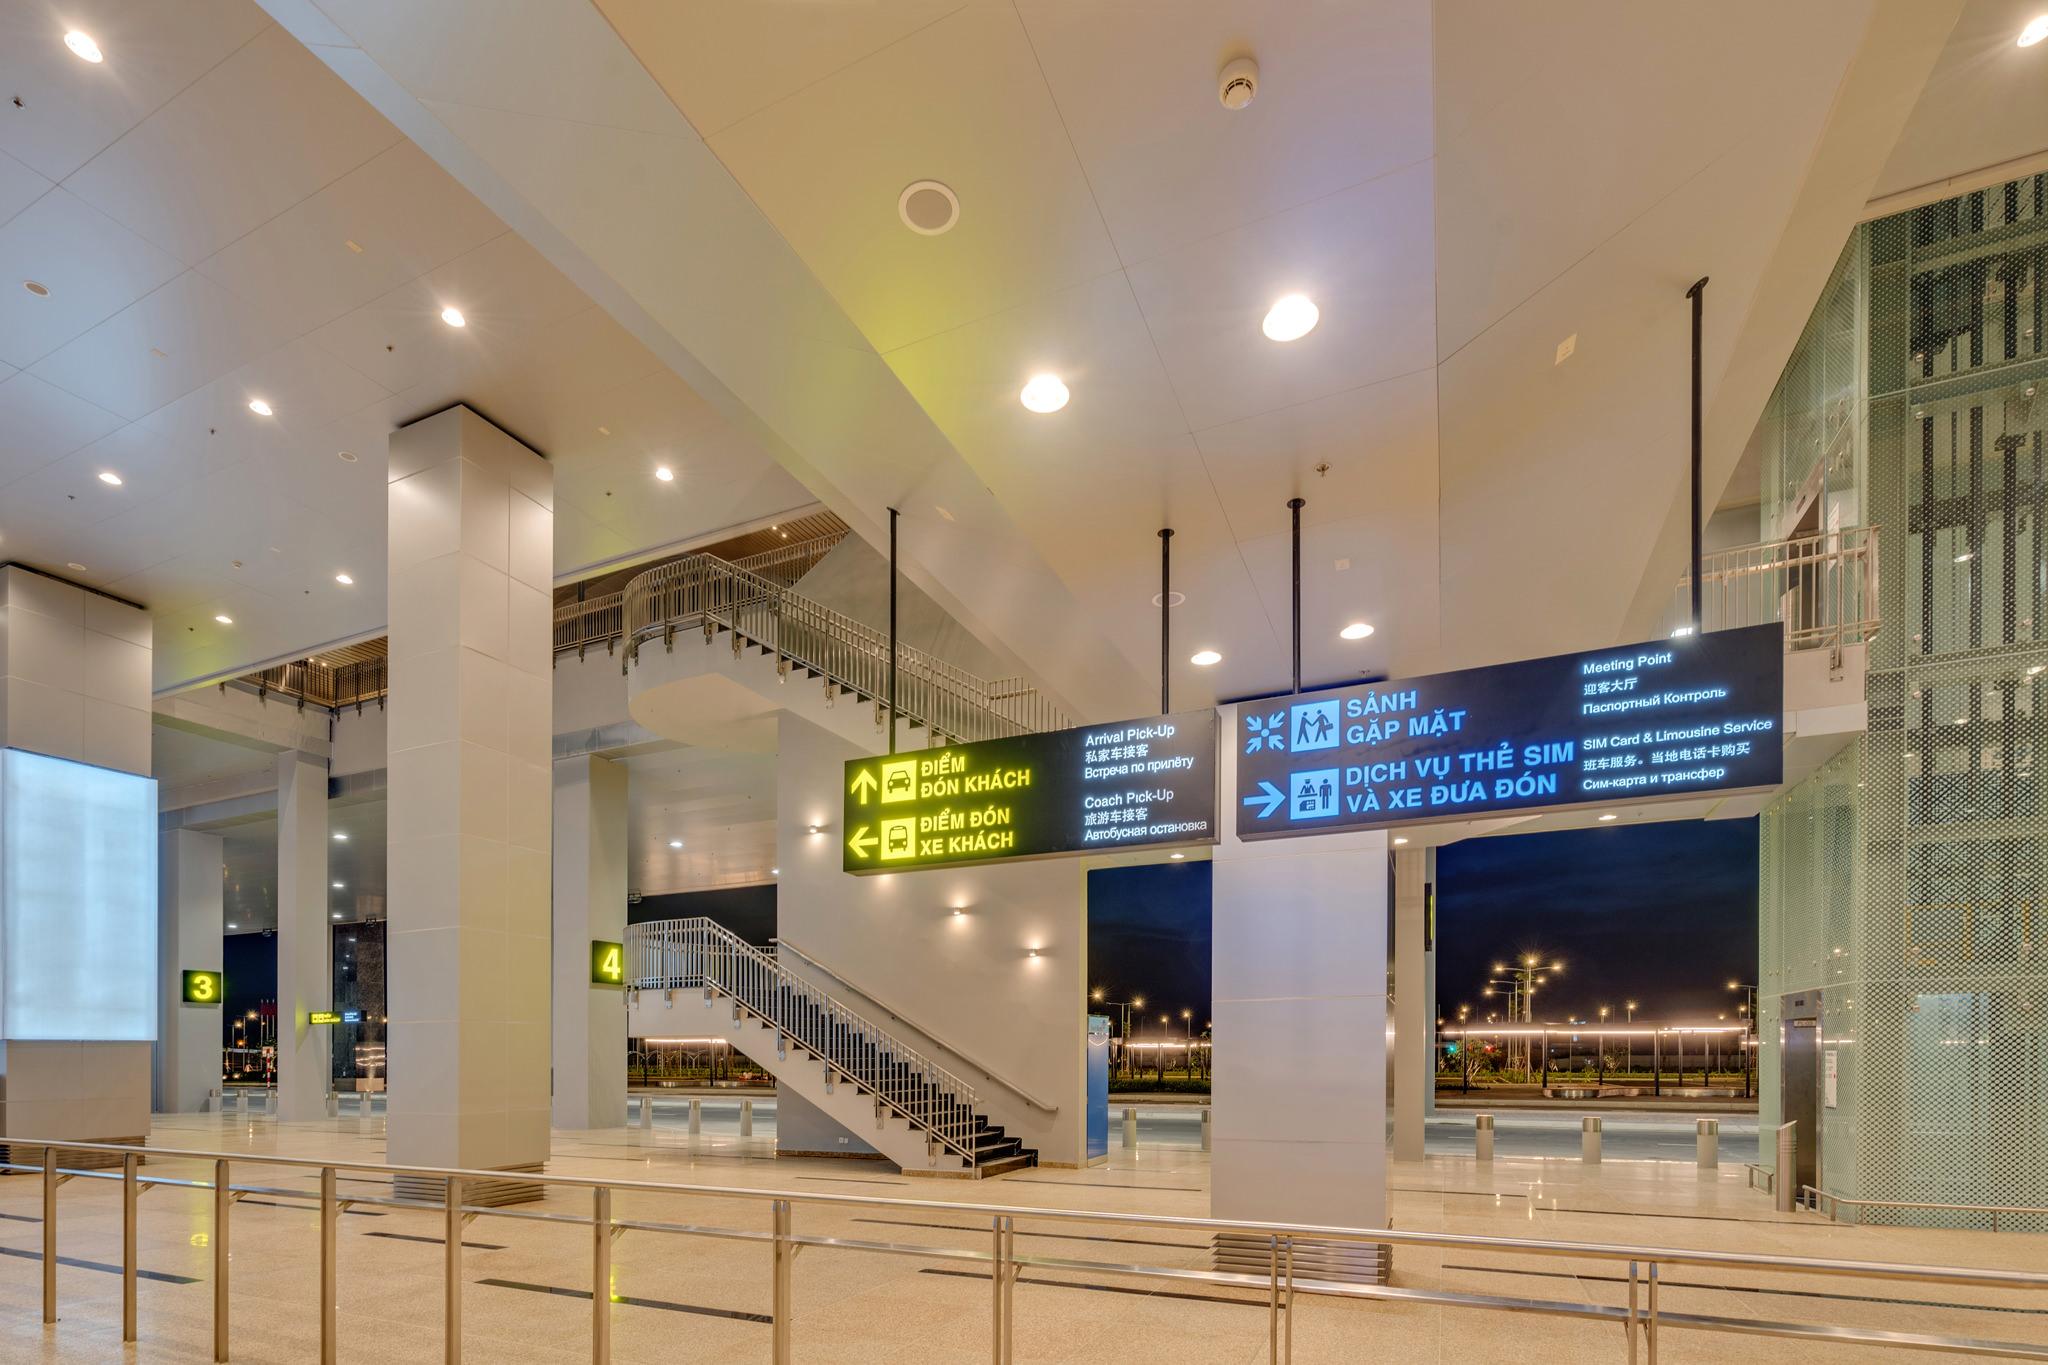 20180626 - Cam Ranh Airport - Architecture - 0422.jpg